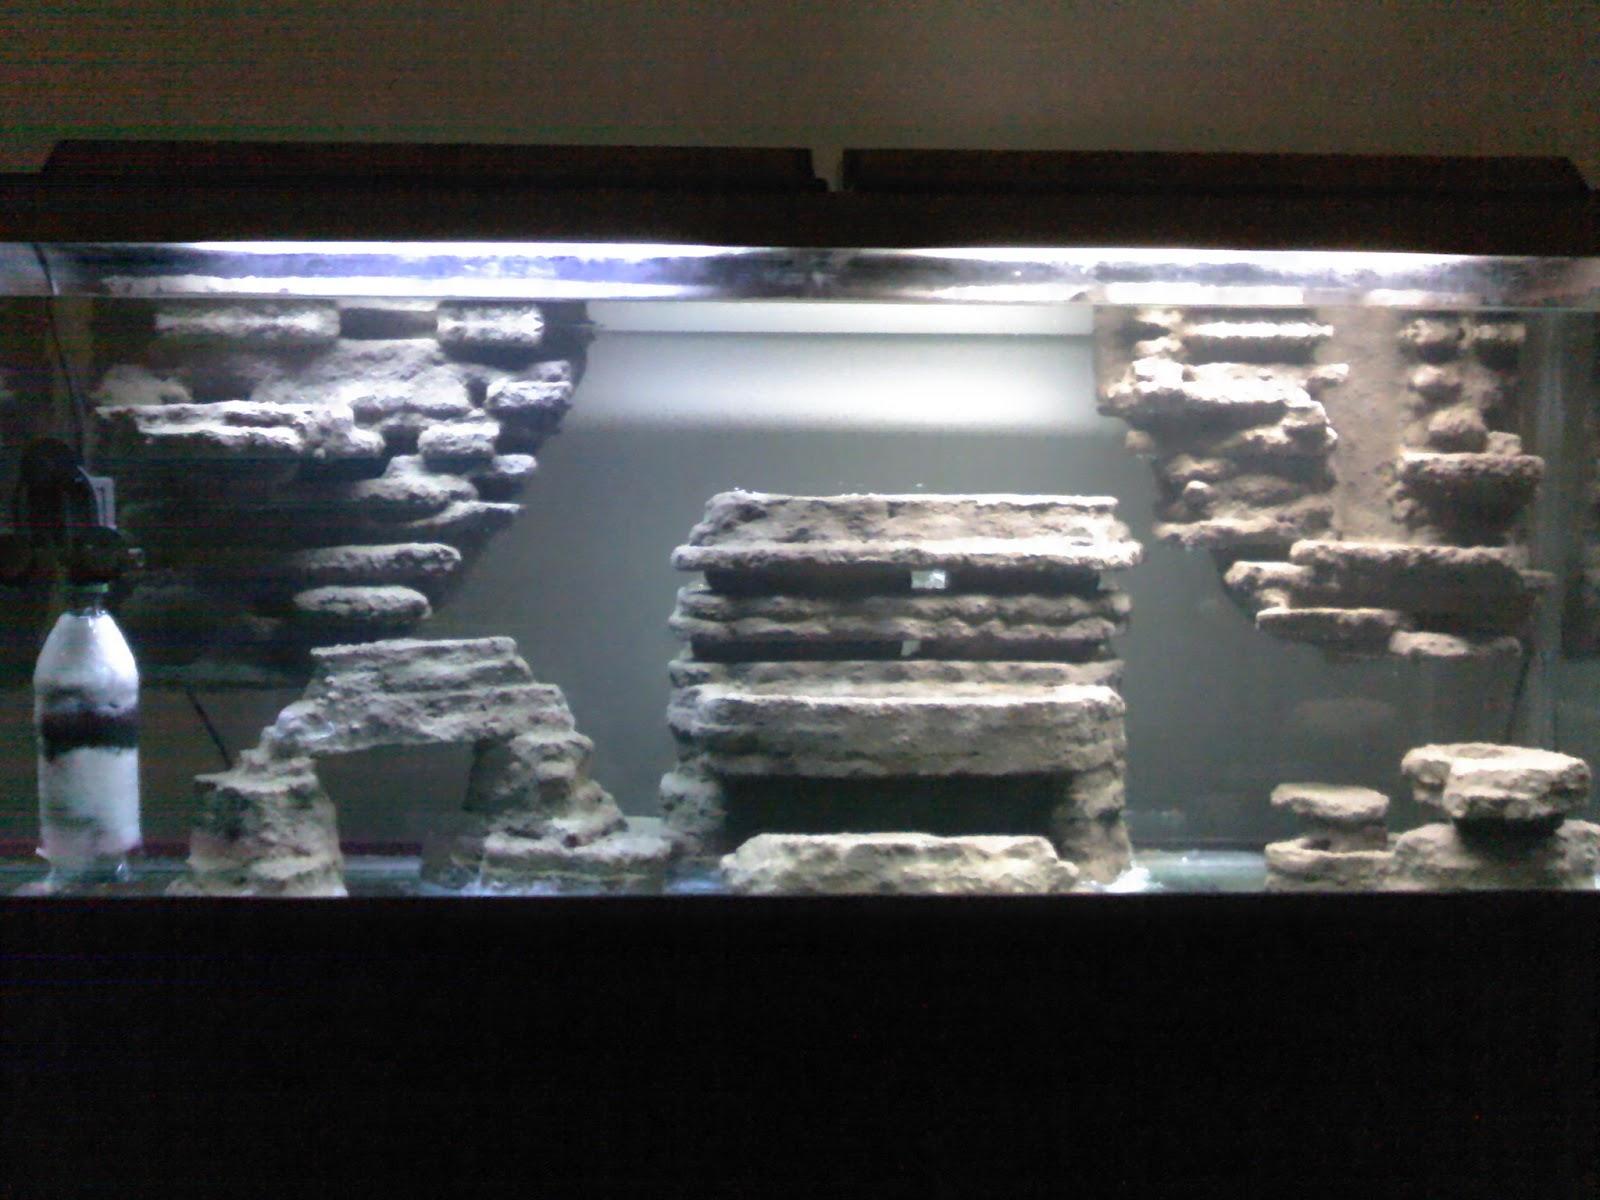 Unduh 7500 Background Aquarium Dengan Styrofoam Terbaik